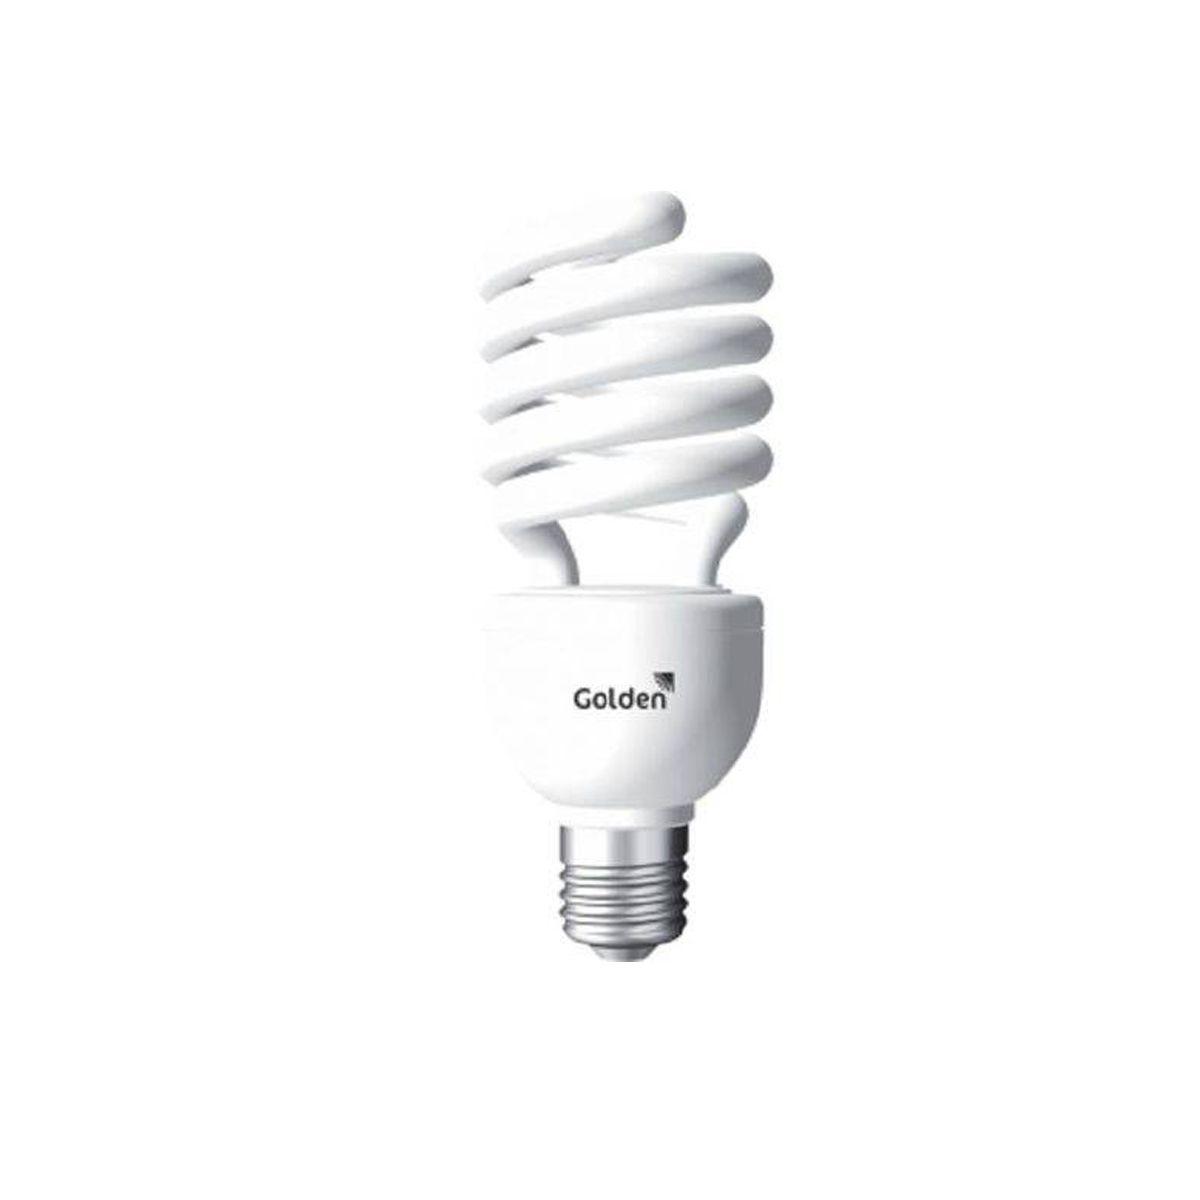 Lâmpada Fluorescente Espiral 85W 220V Golden